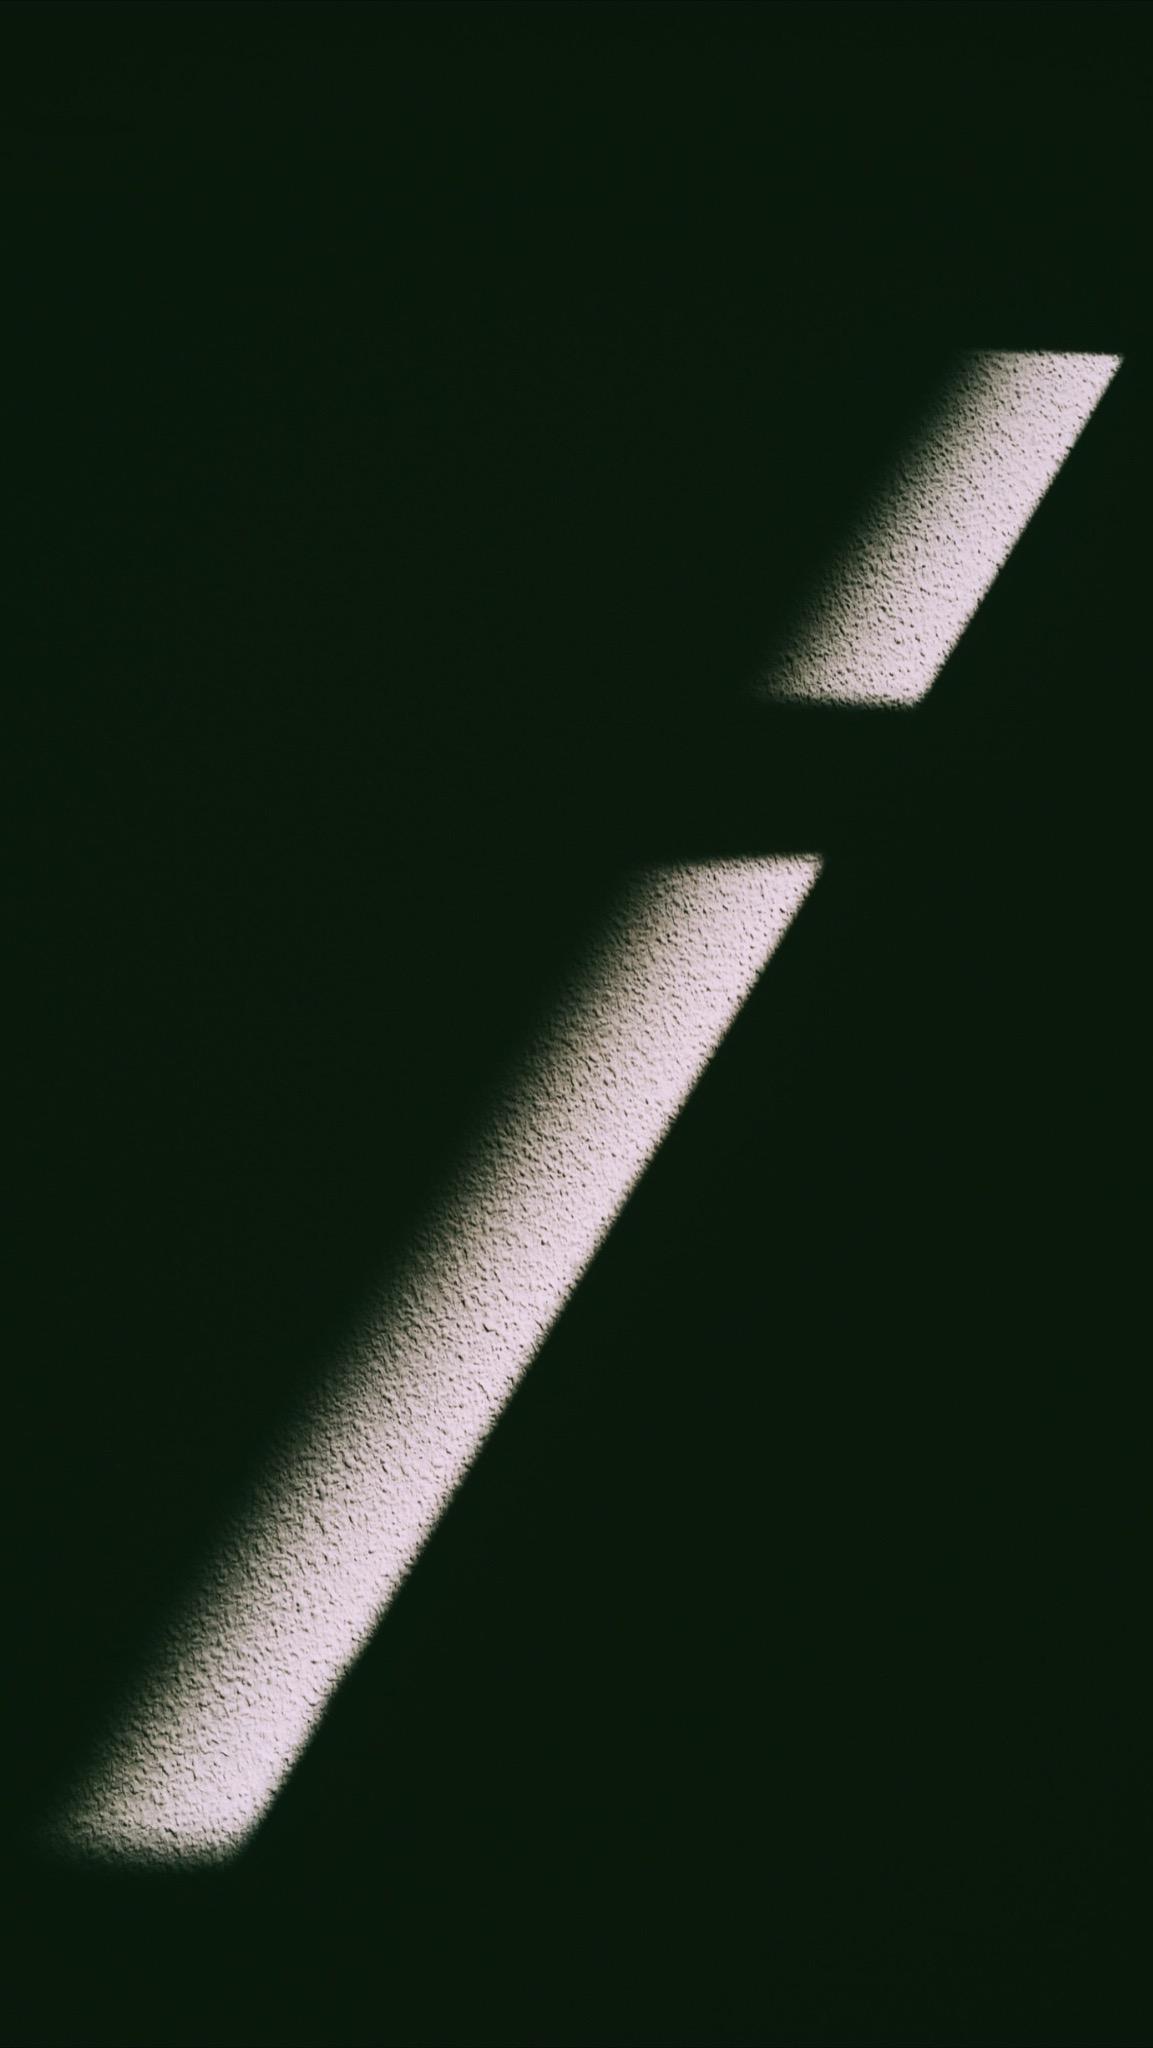 Foto 15.11.16, 14 17 04.jpg